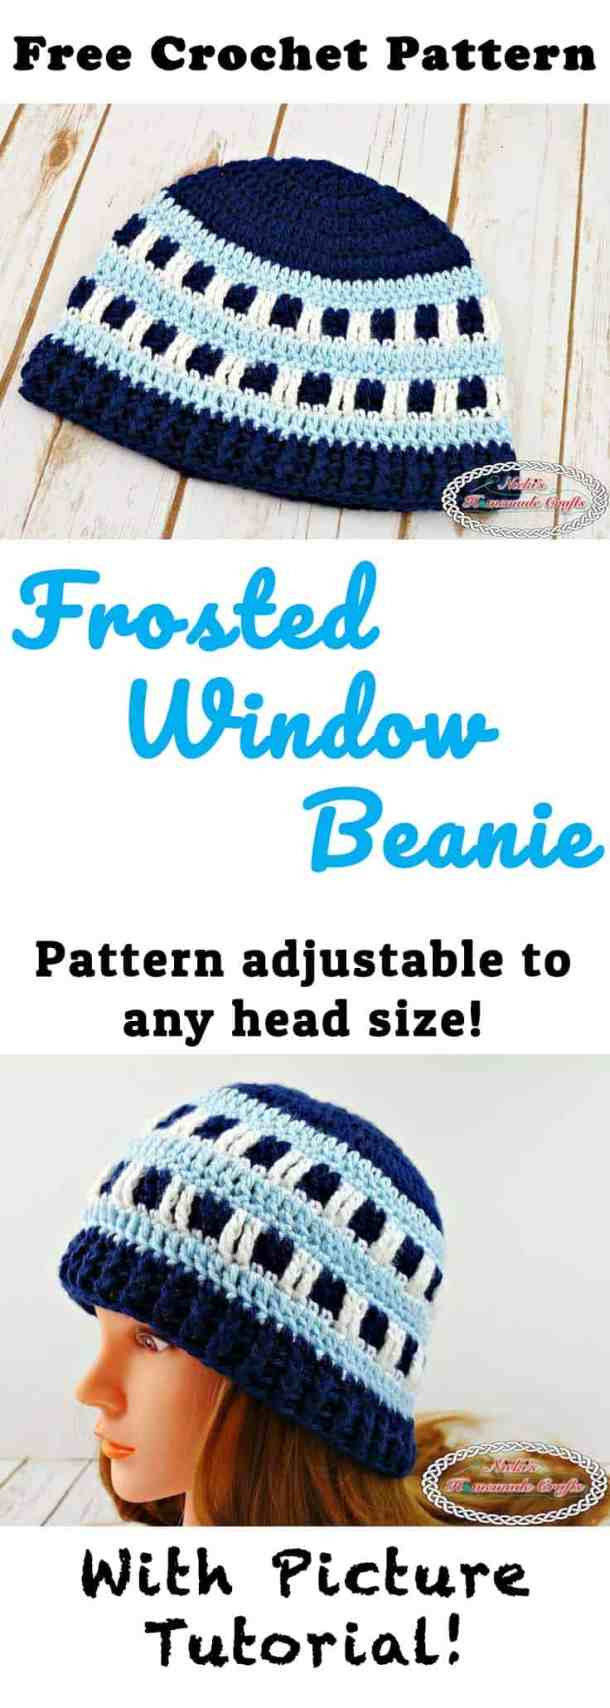 Frosted Window Beanie - Free Crochet Pattern by Nicki's Homemade Crafts #freecrochetpattern #crochet #frosted #frosty #window #beanie #hat #blue #head